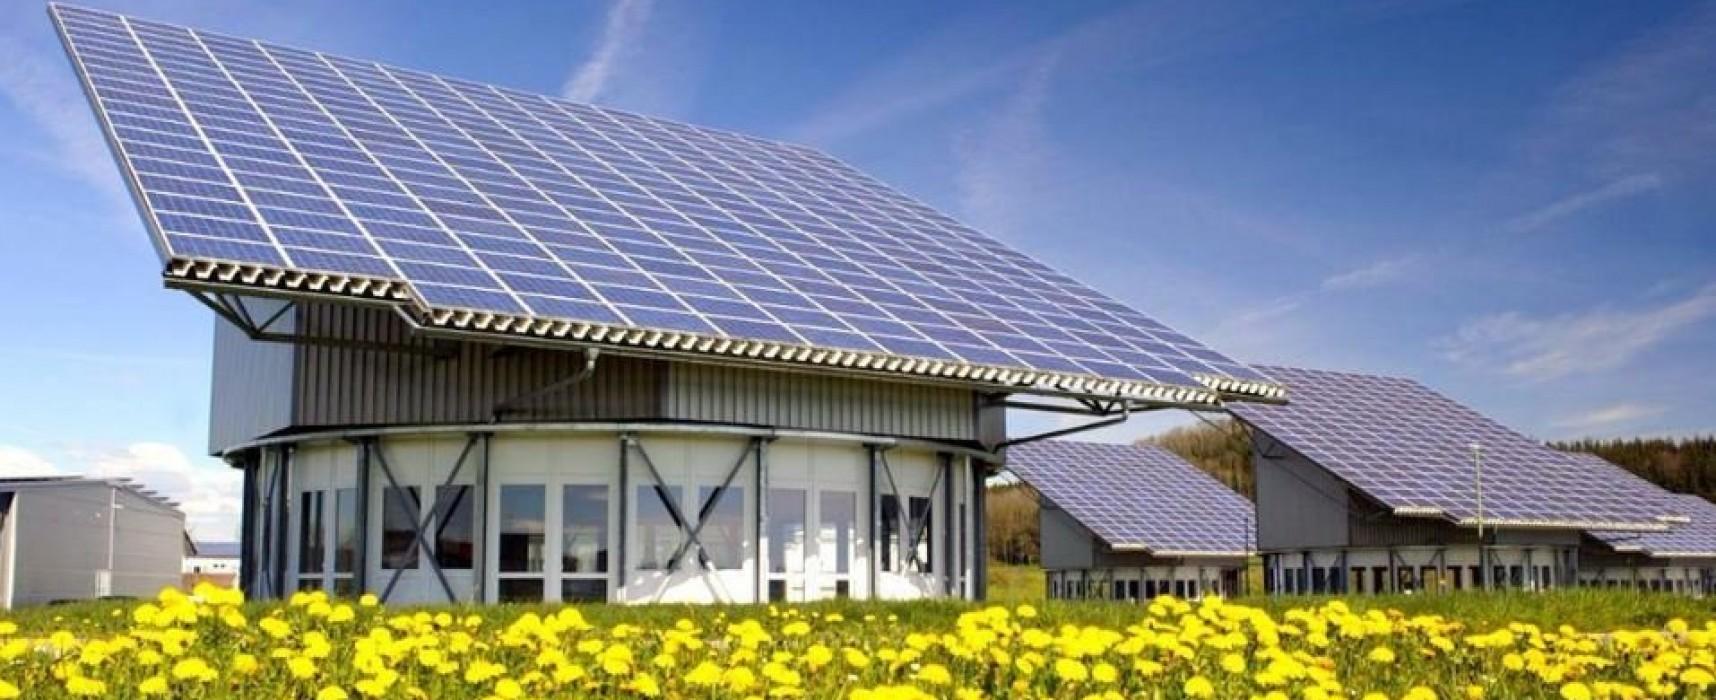 West Coast Better Homes on How Schwarzenegger Helped California Go Solar